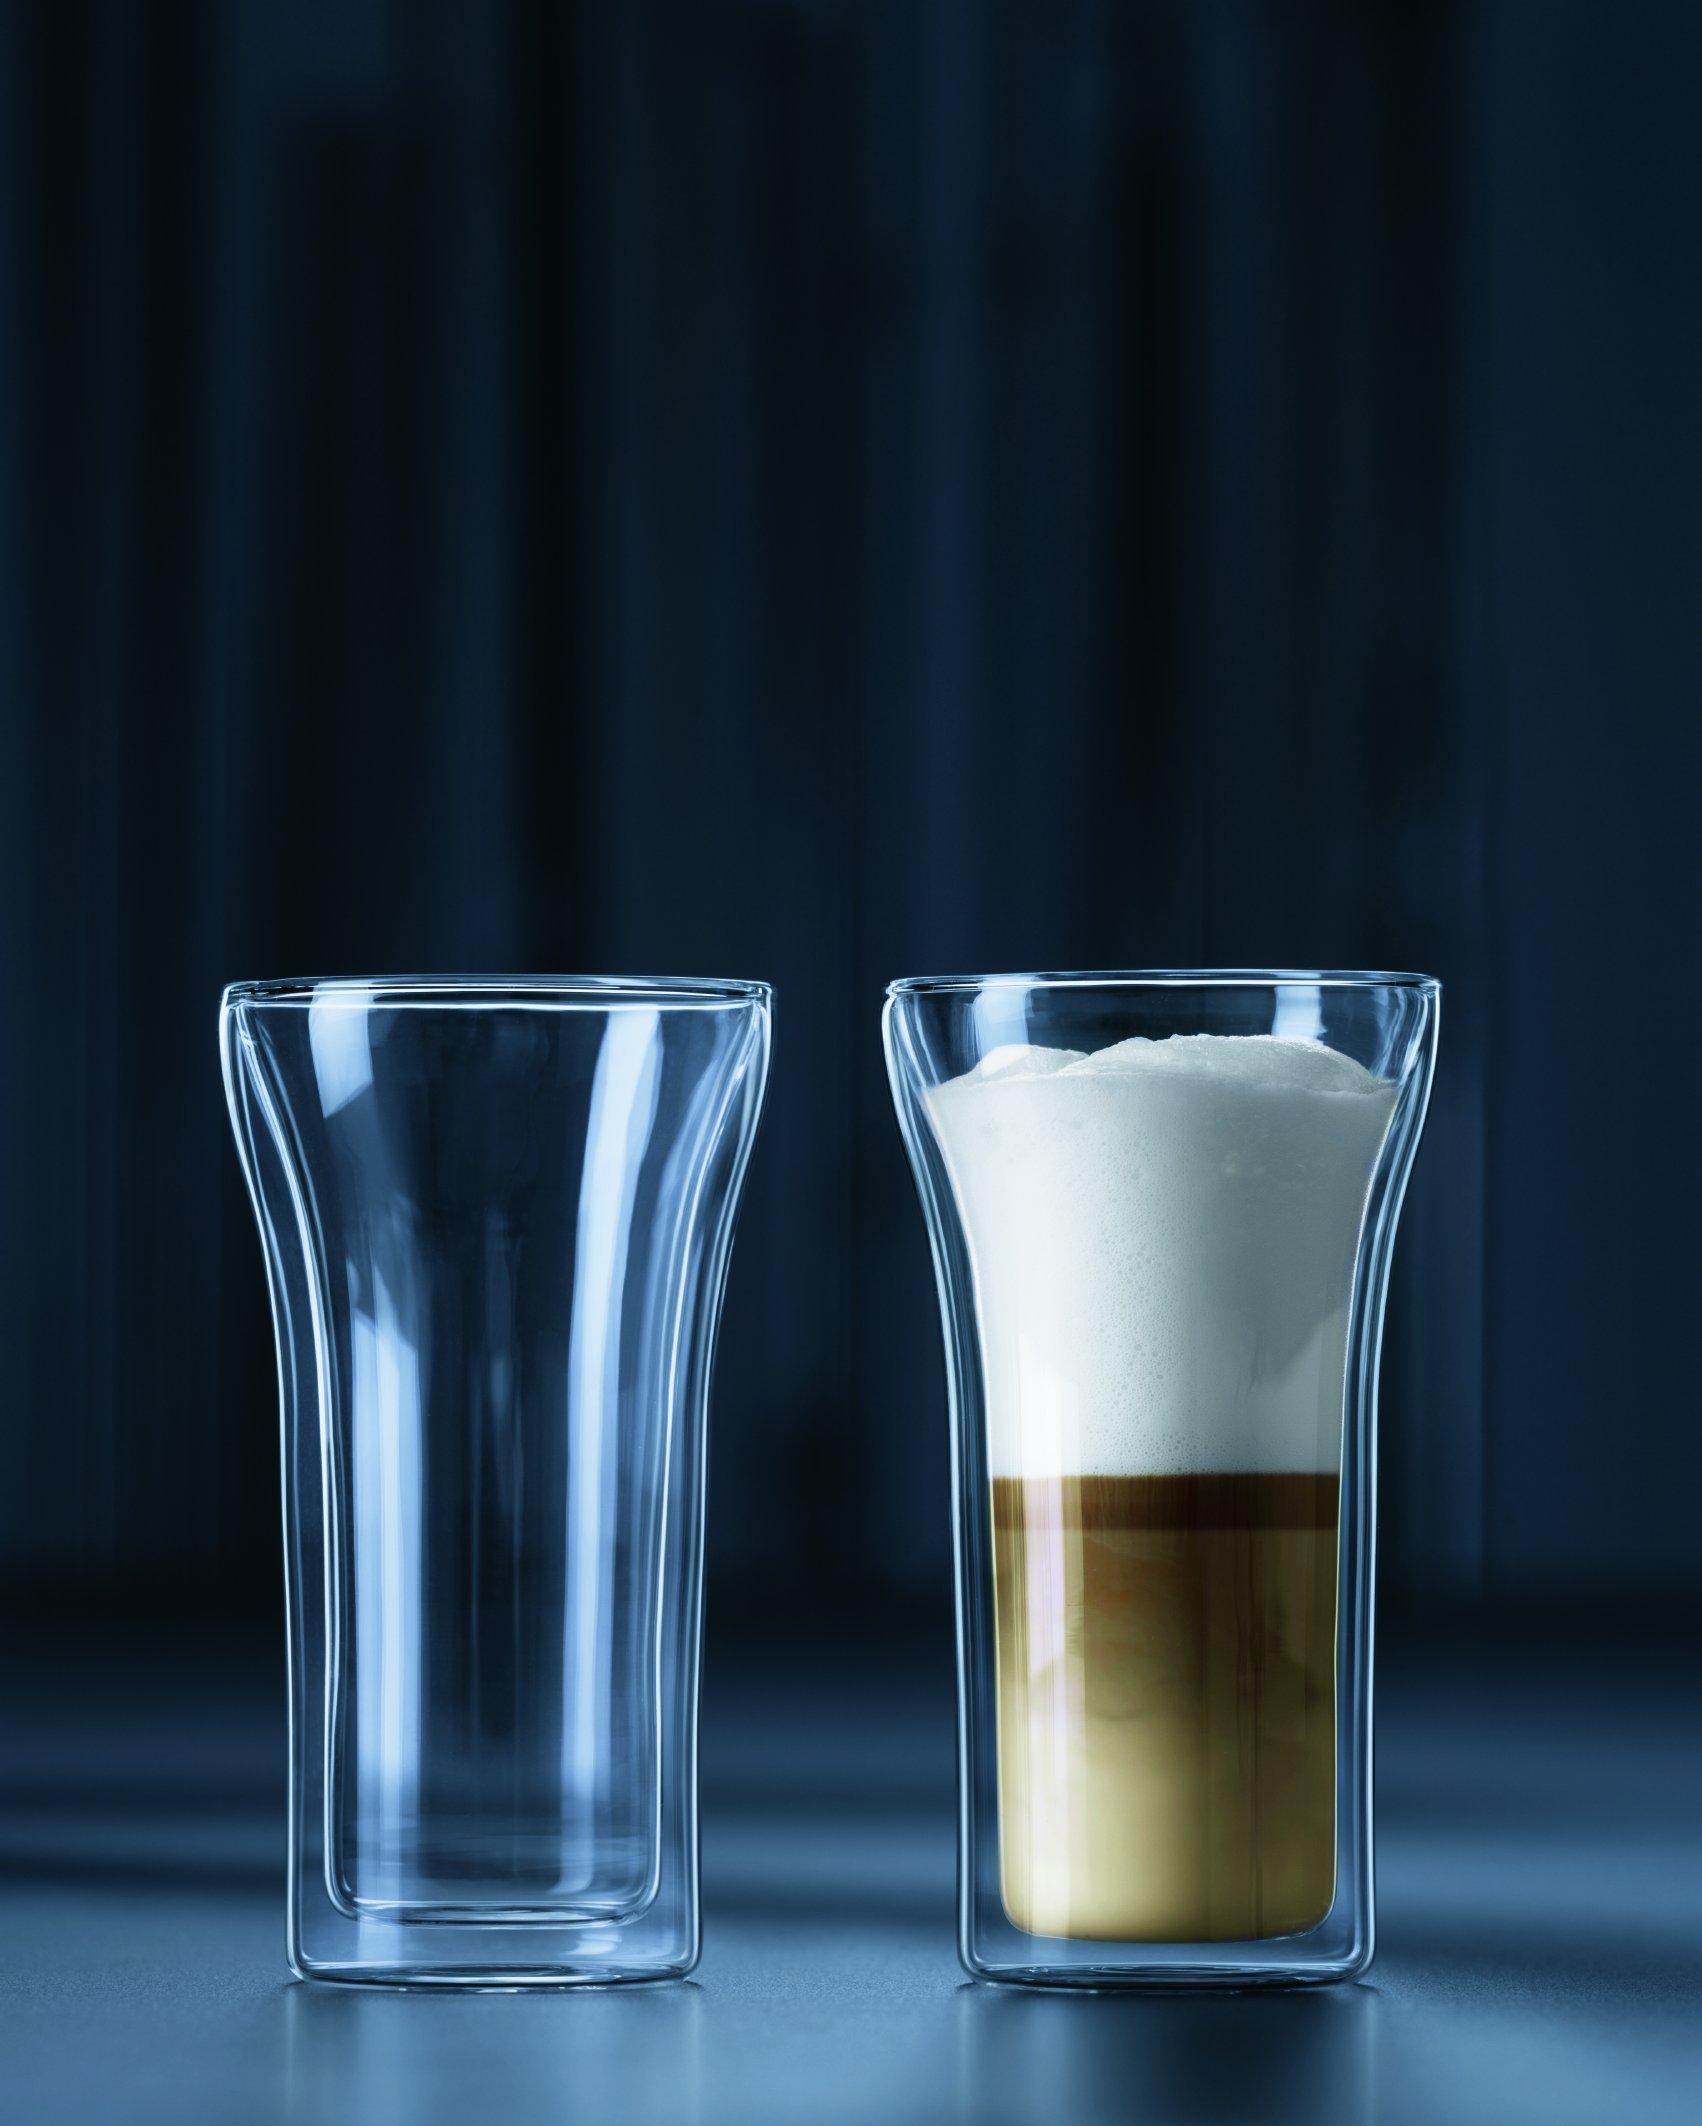 Bodum Assam Double Wall Glass, Set of 2, 0.4 l, 13.5 oz., Clear by Bodum (Image #2)